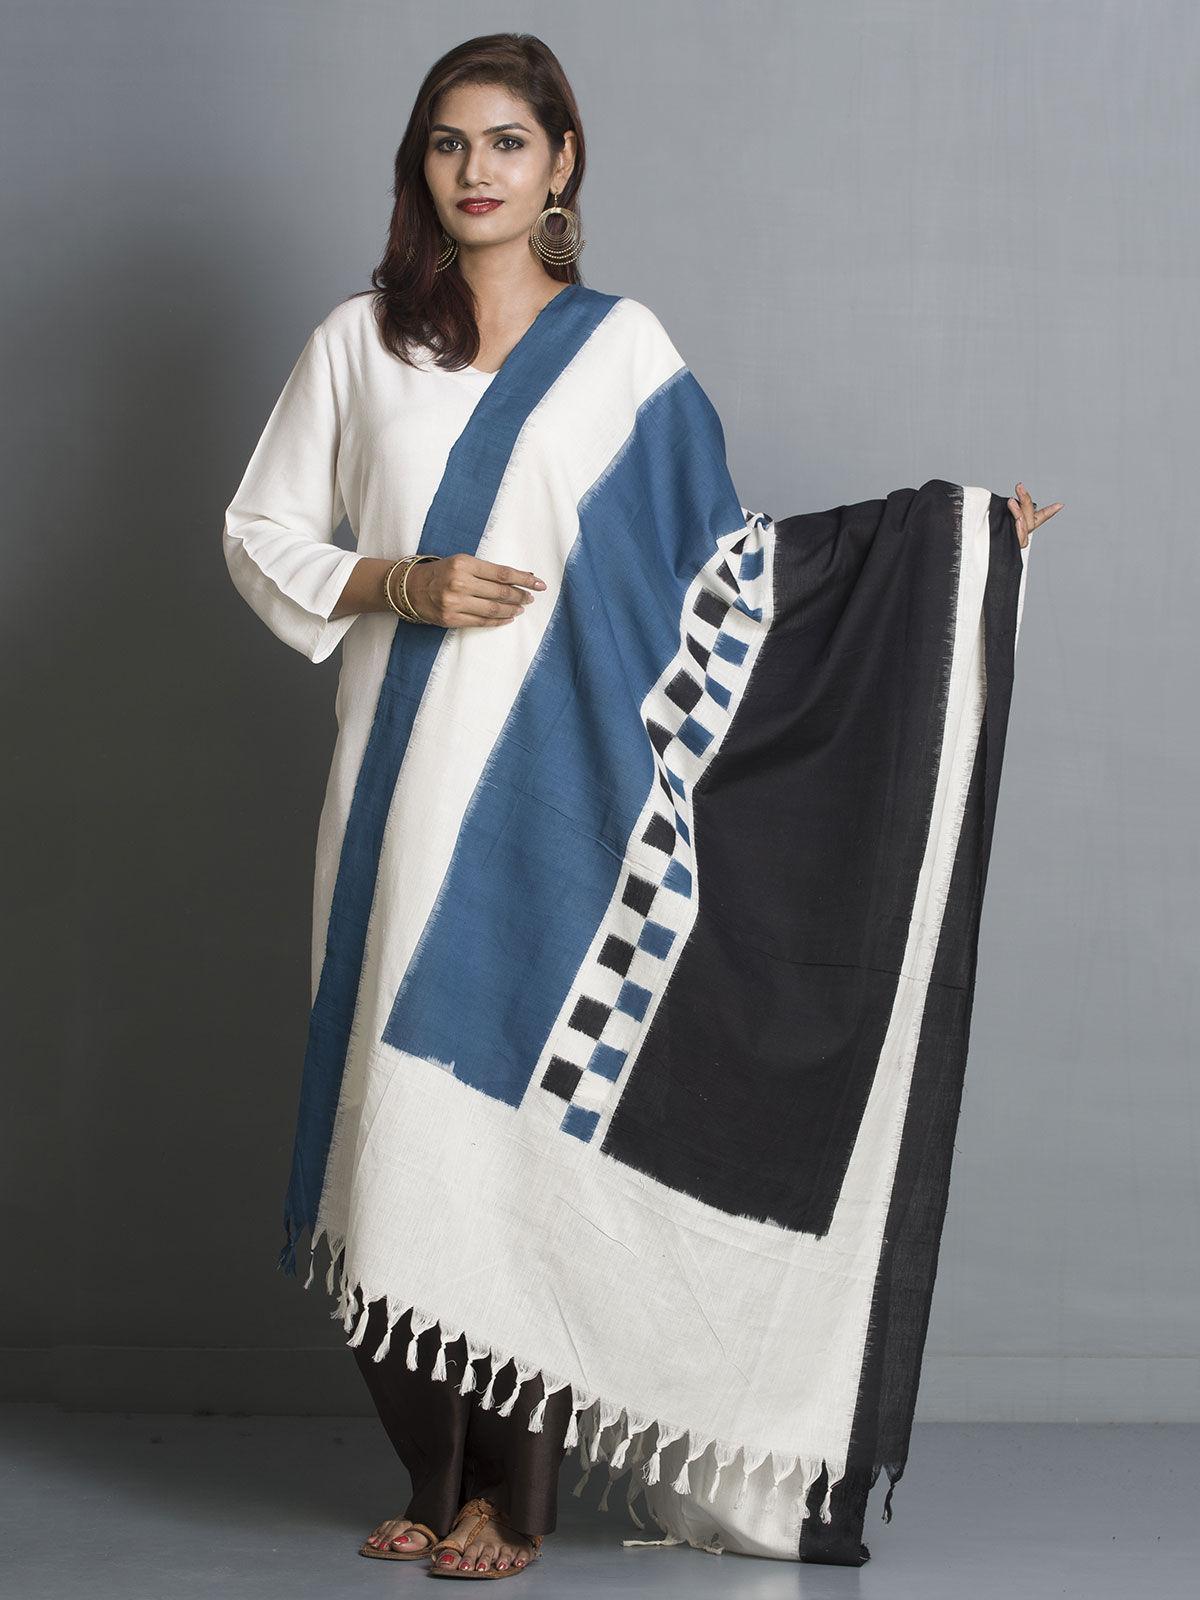 Blue and black ikat cotton dupatta